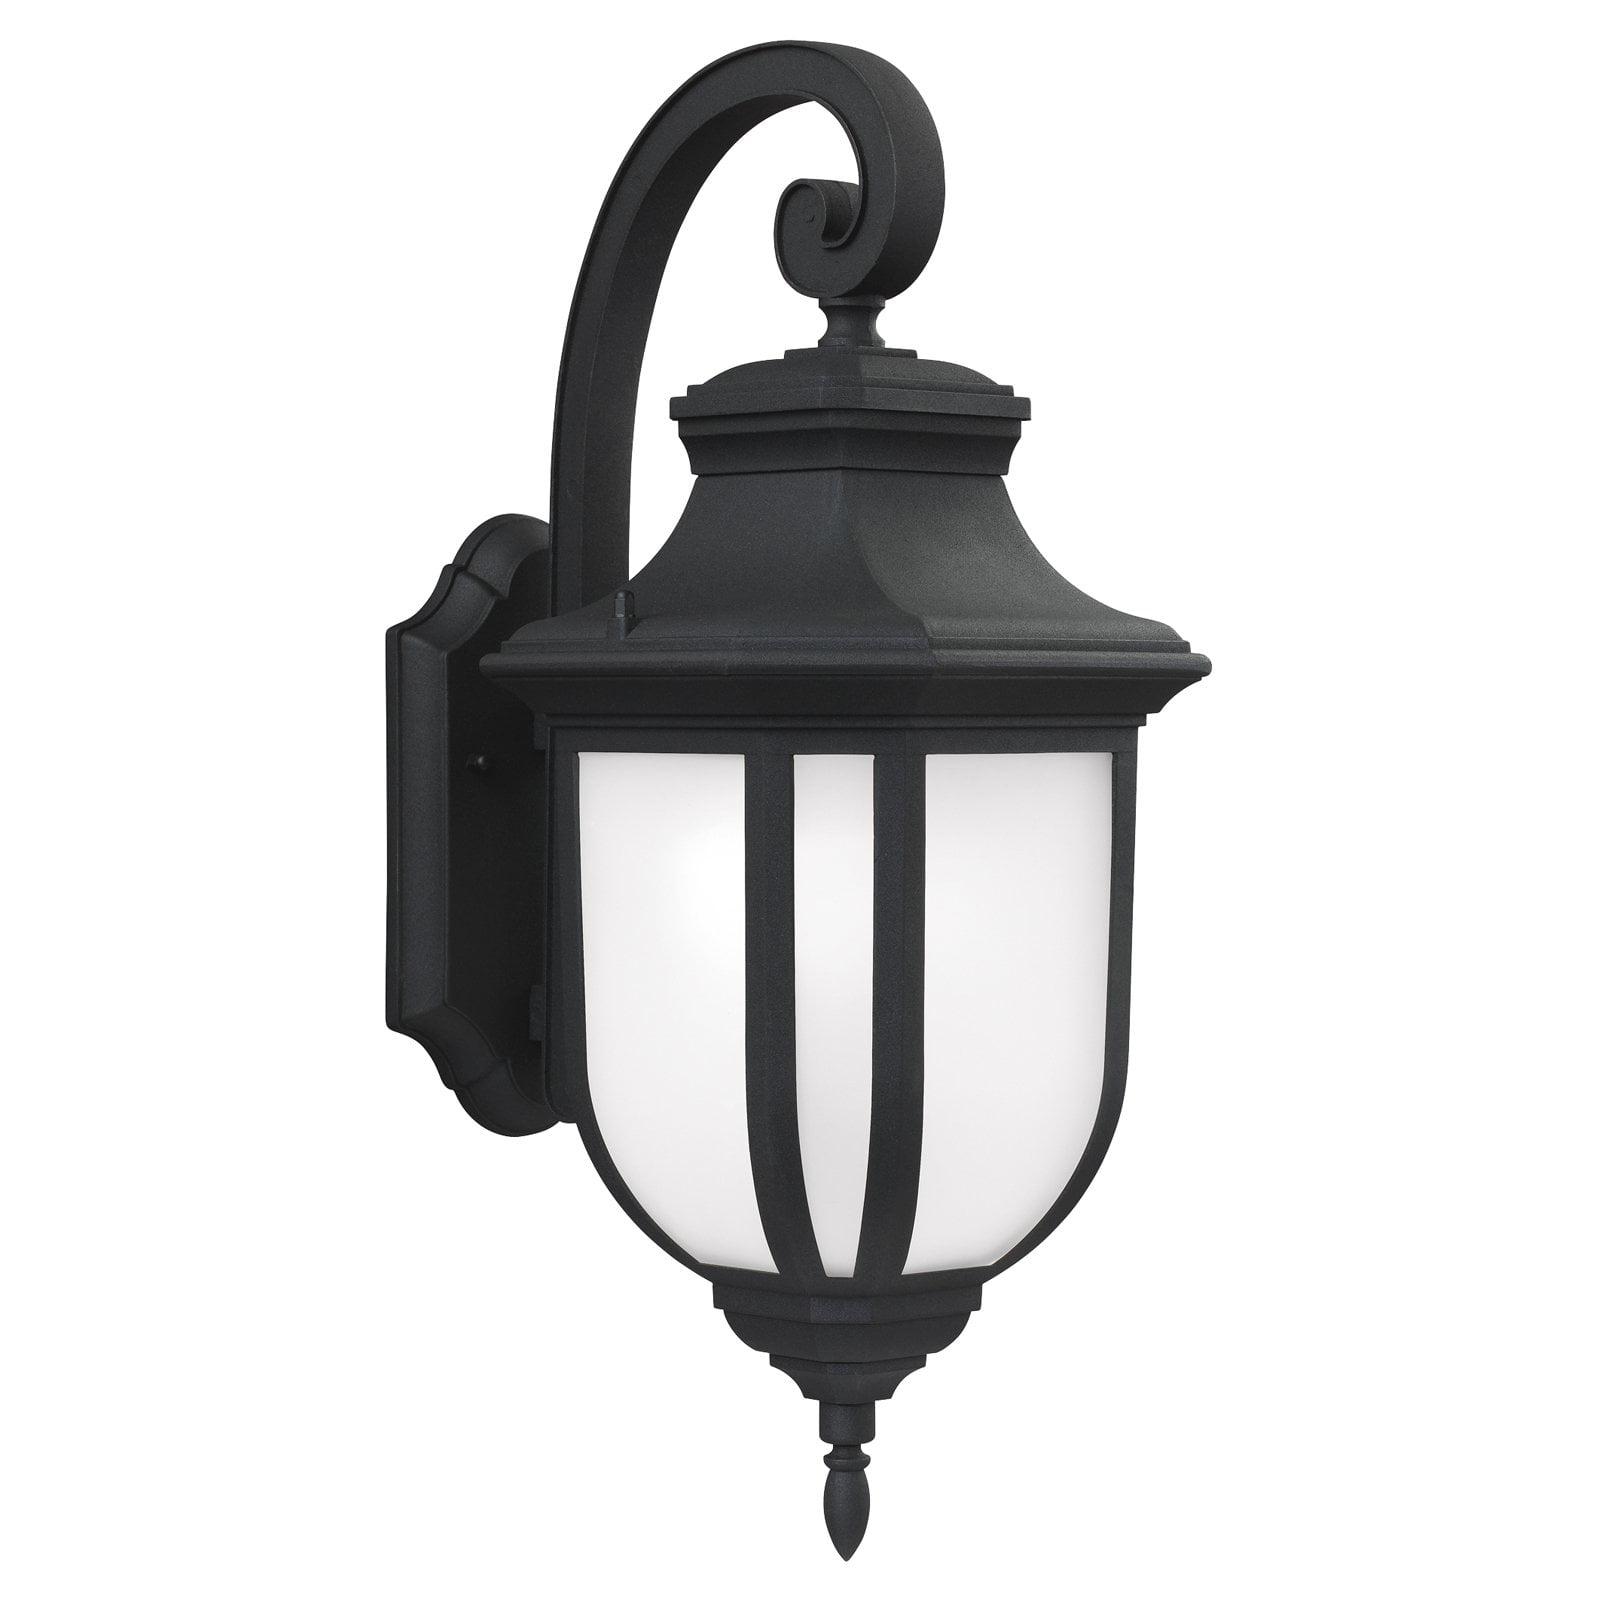 Sea Gull Lighting Childress 8736301-12 Outdoor Wall Lantern